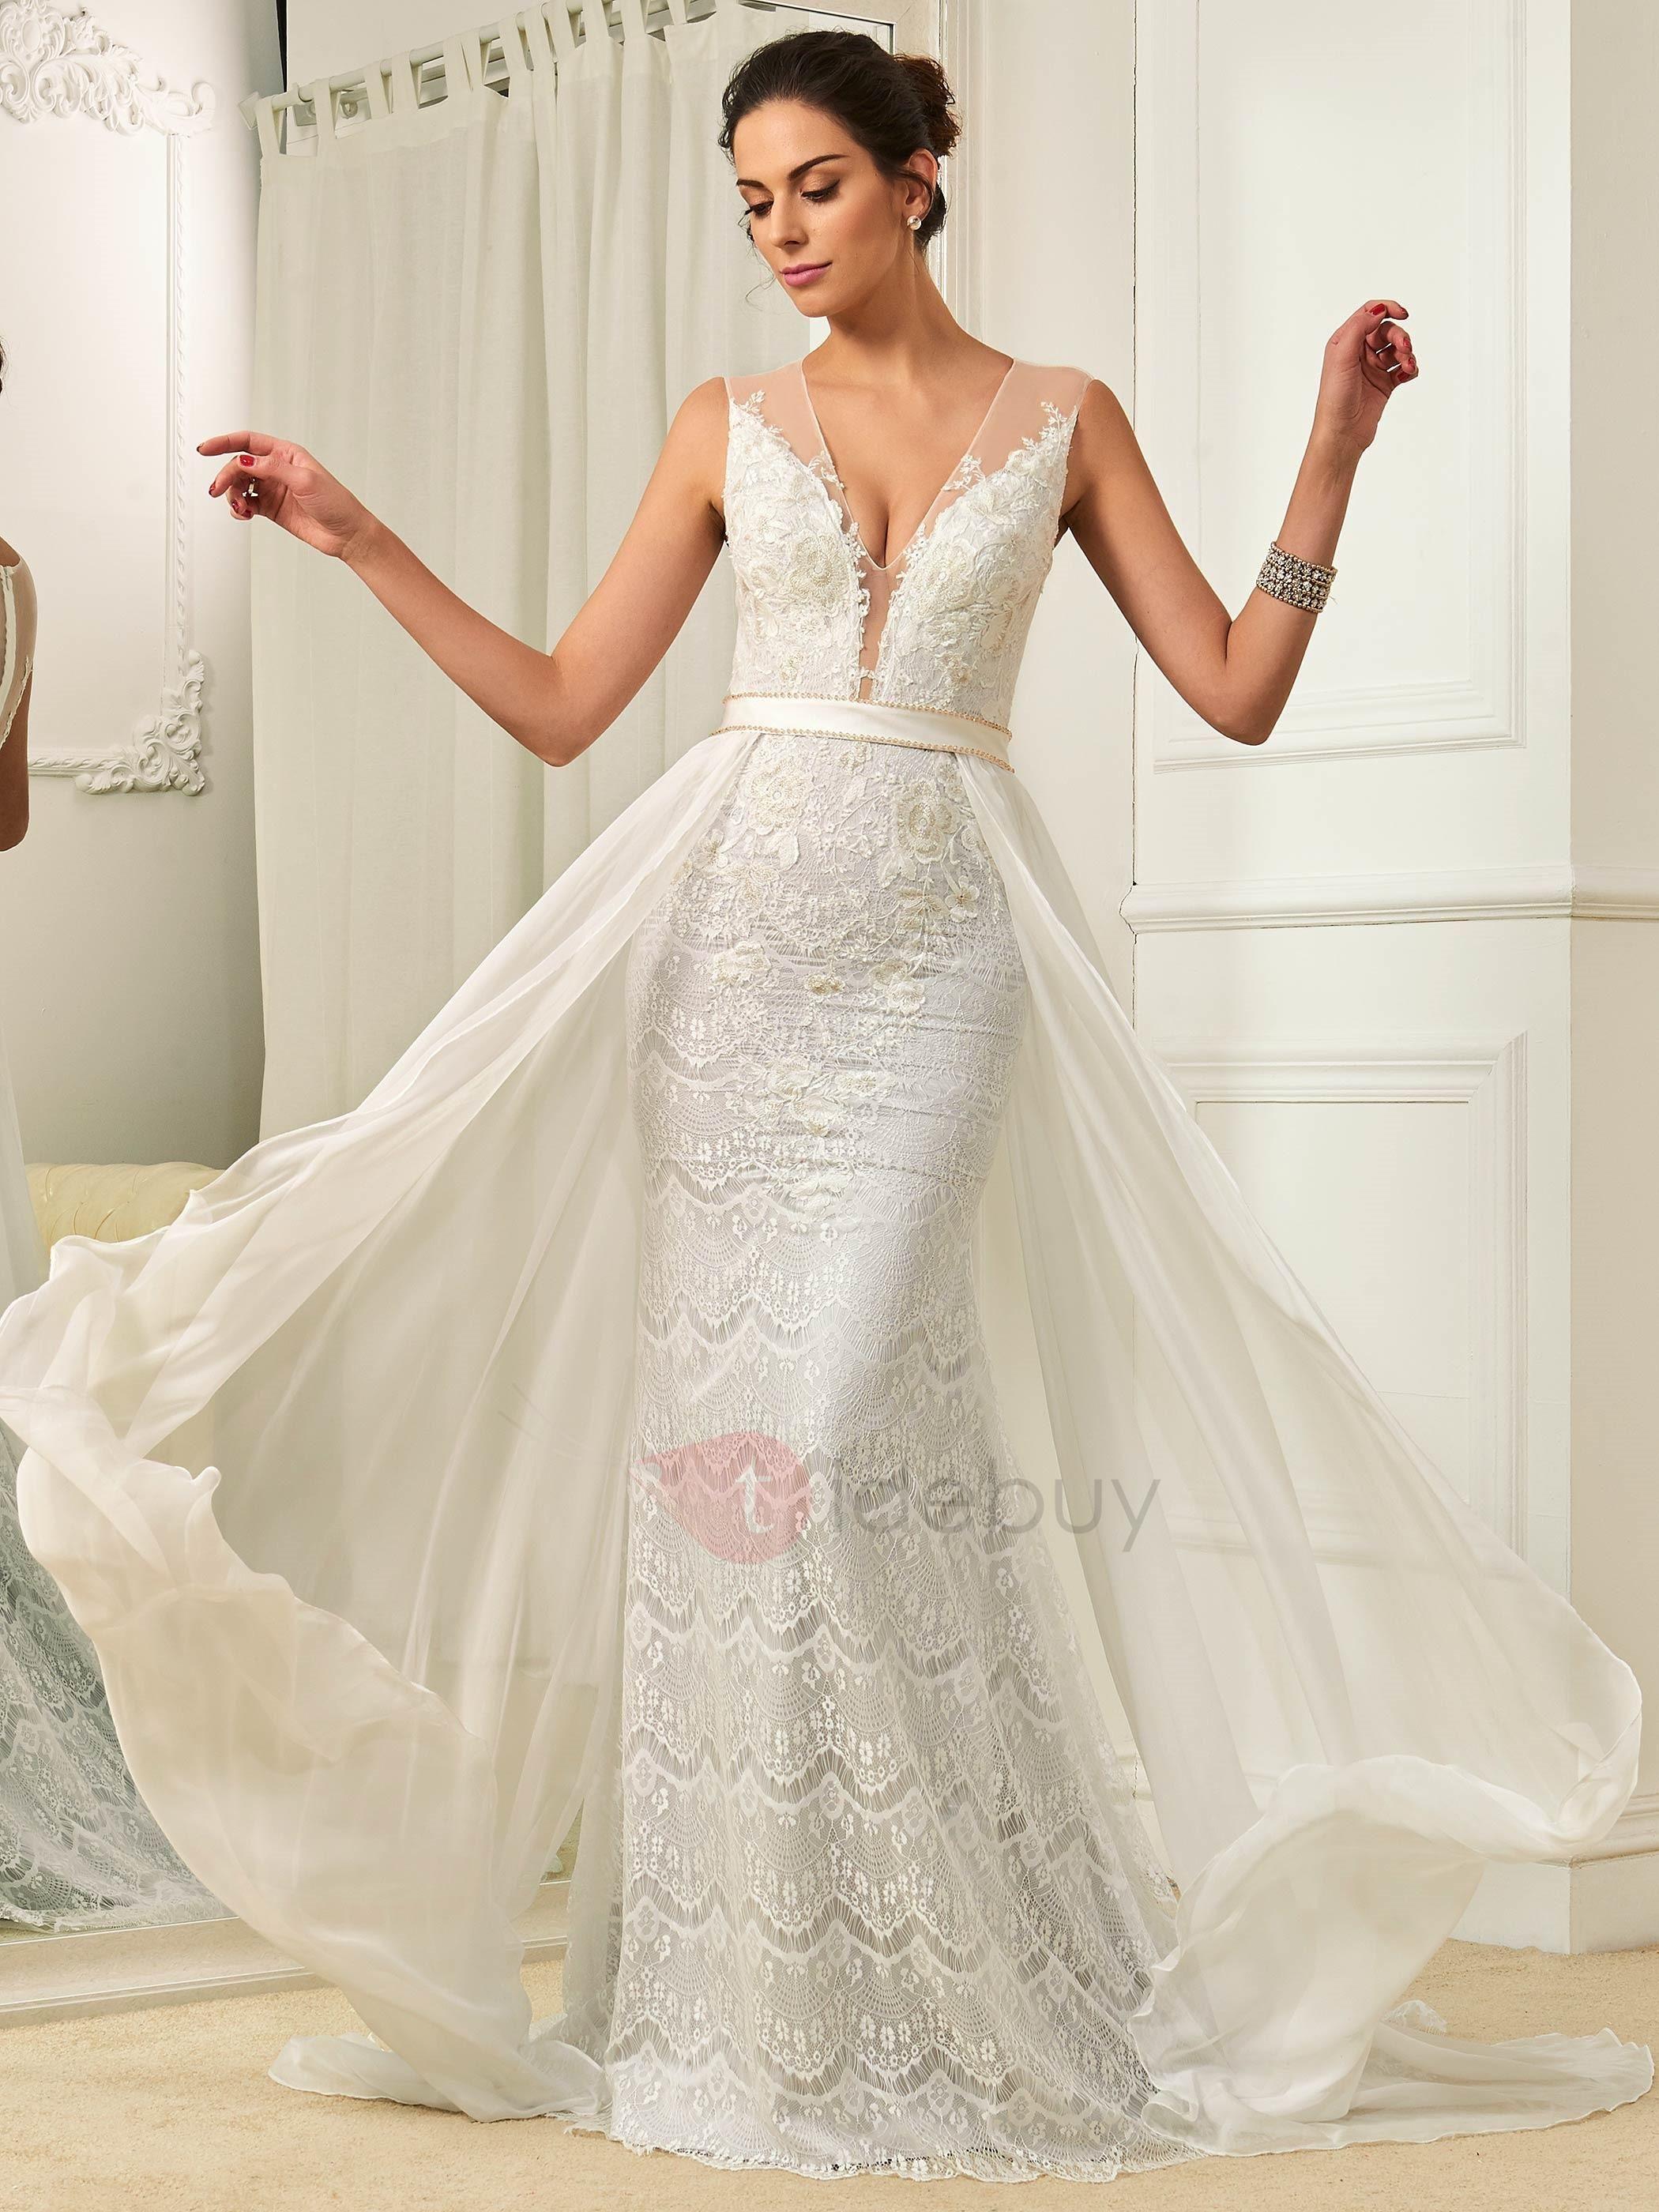 Tidebuy tidebuy fresh v neck lace mermaid watteau train wedding